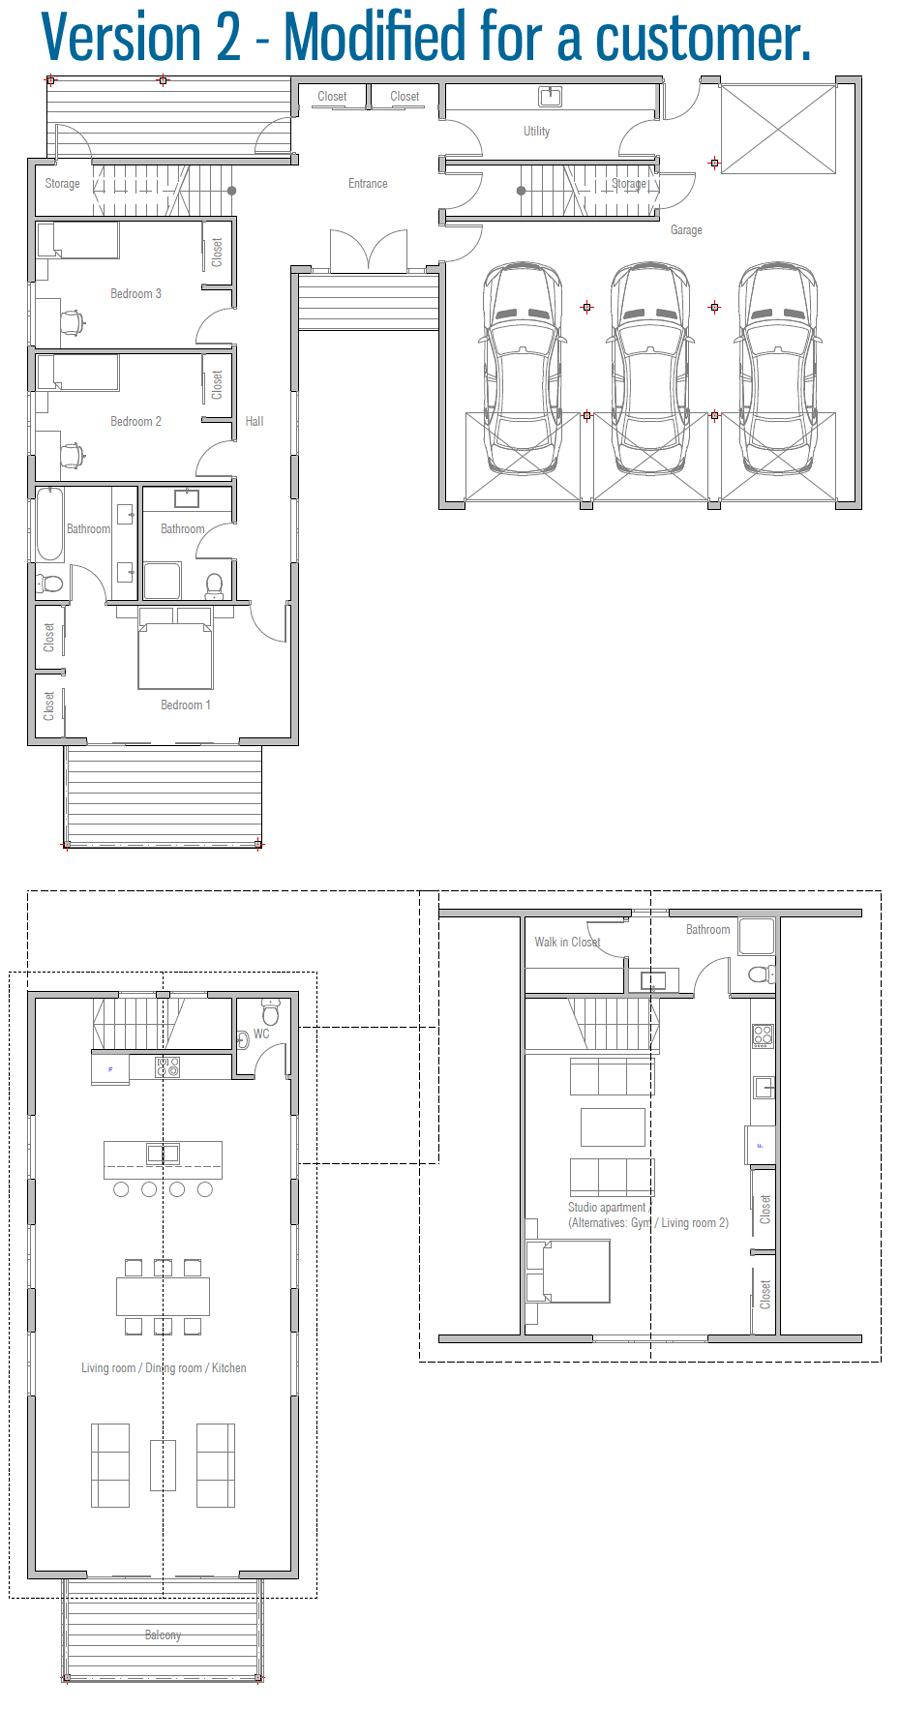 classical-designs_30_CH593_V2.jpg